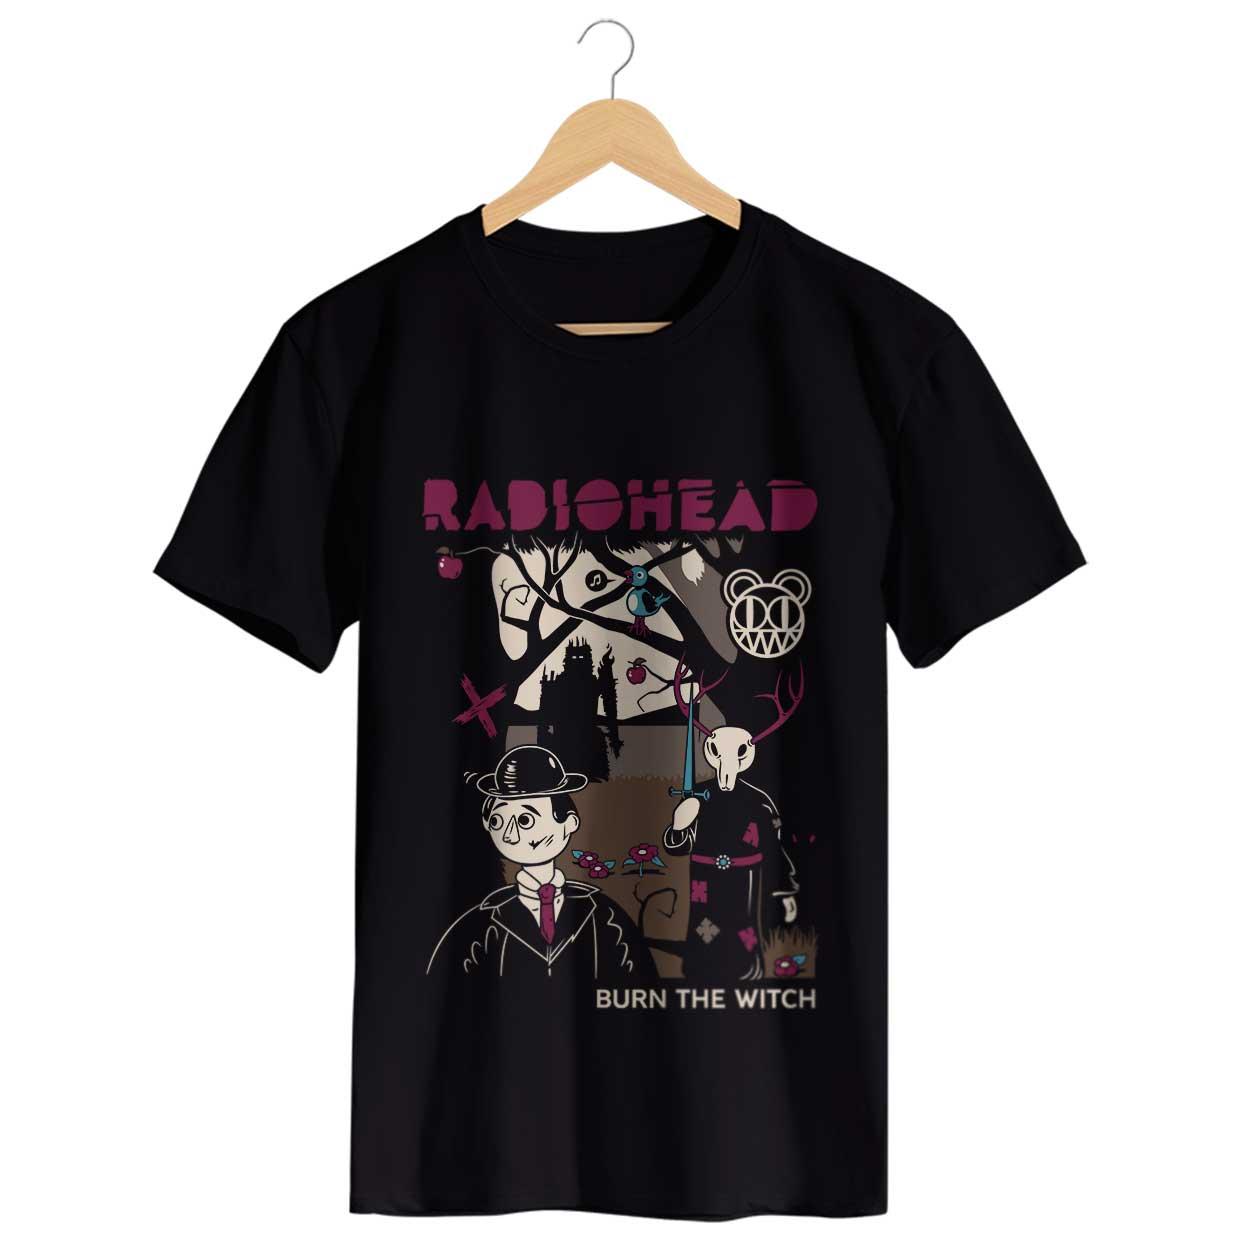 Camiseta - Burn The Witch - Radiohead - Masculino